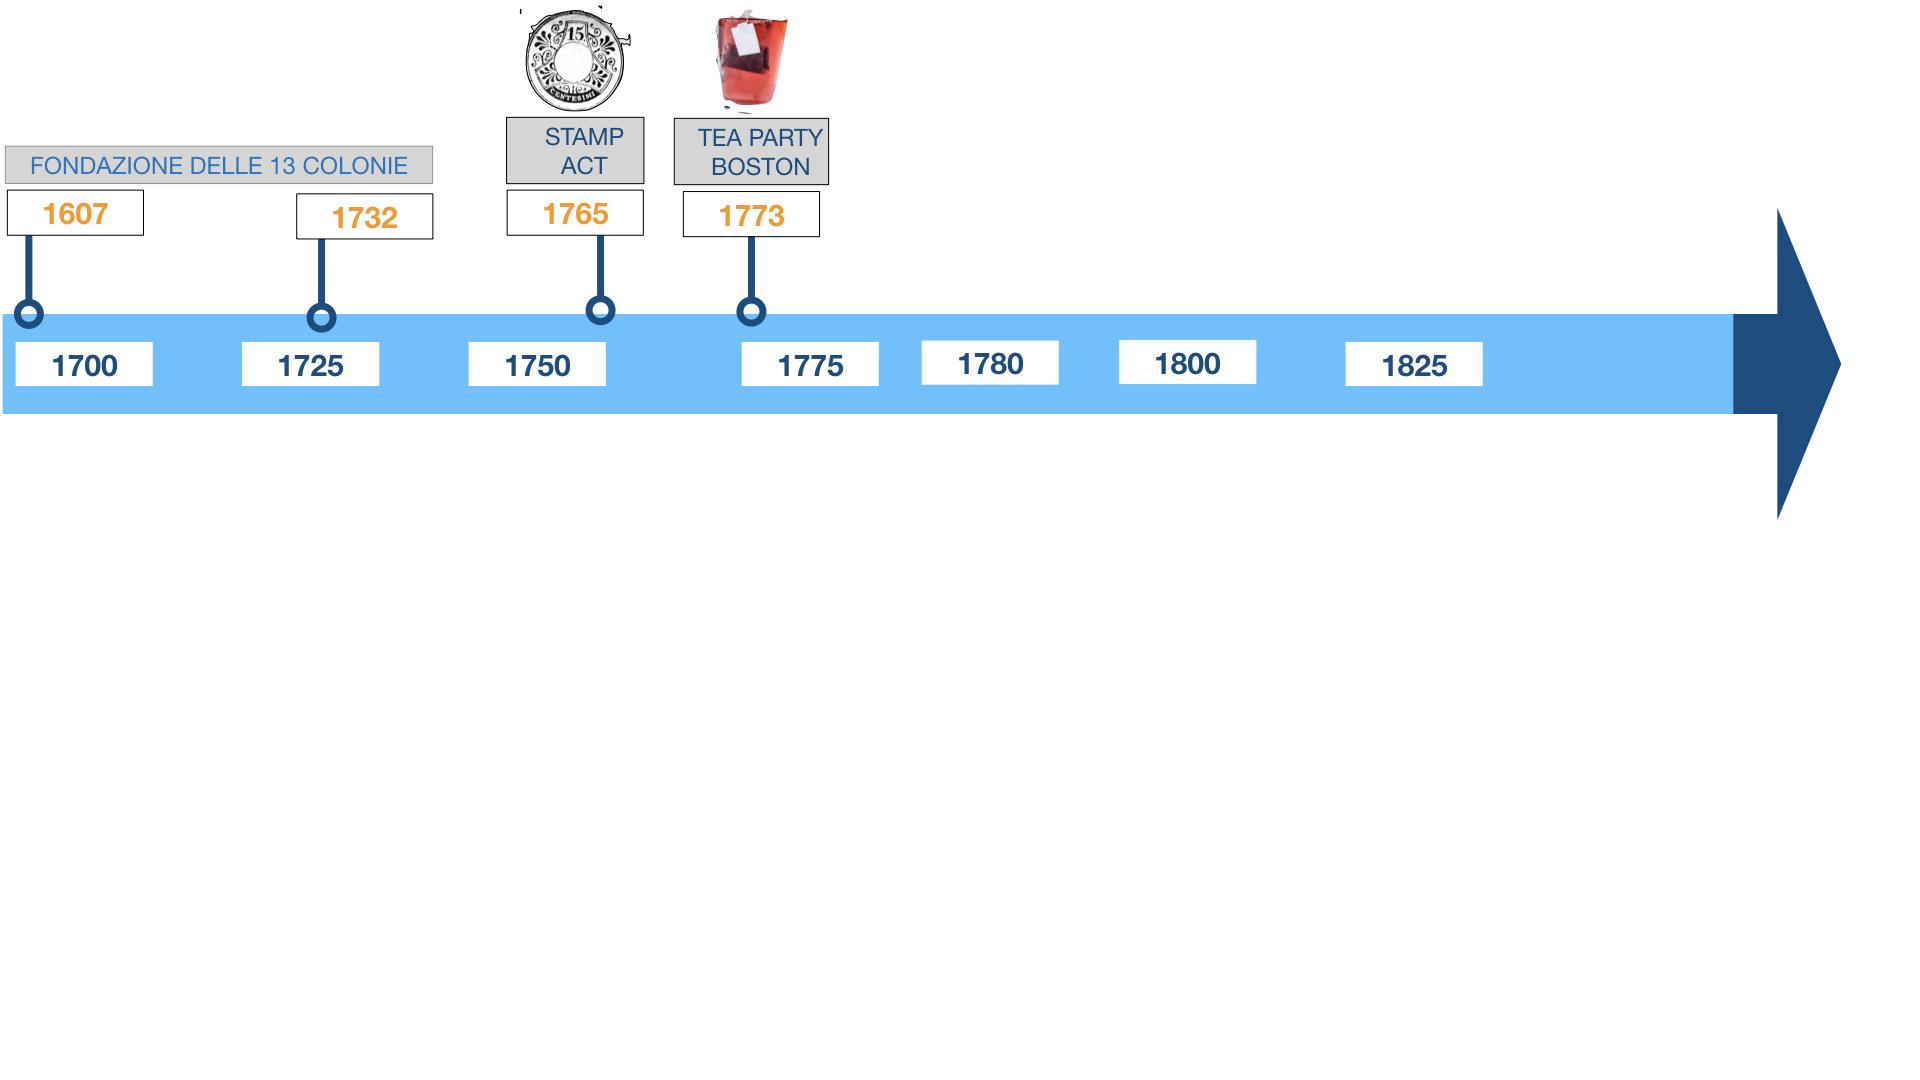 GUERRA DI INDIPENDENZA AMERICANA_SIMULAZIONE.150